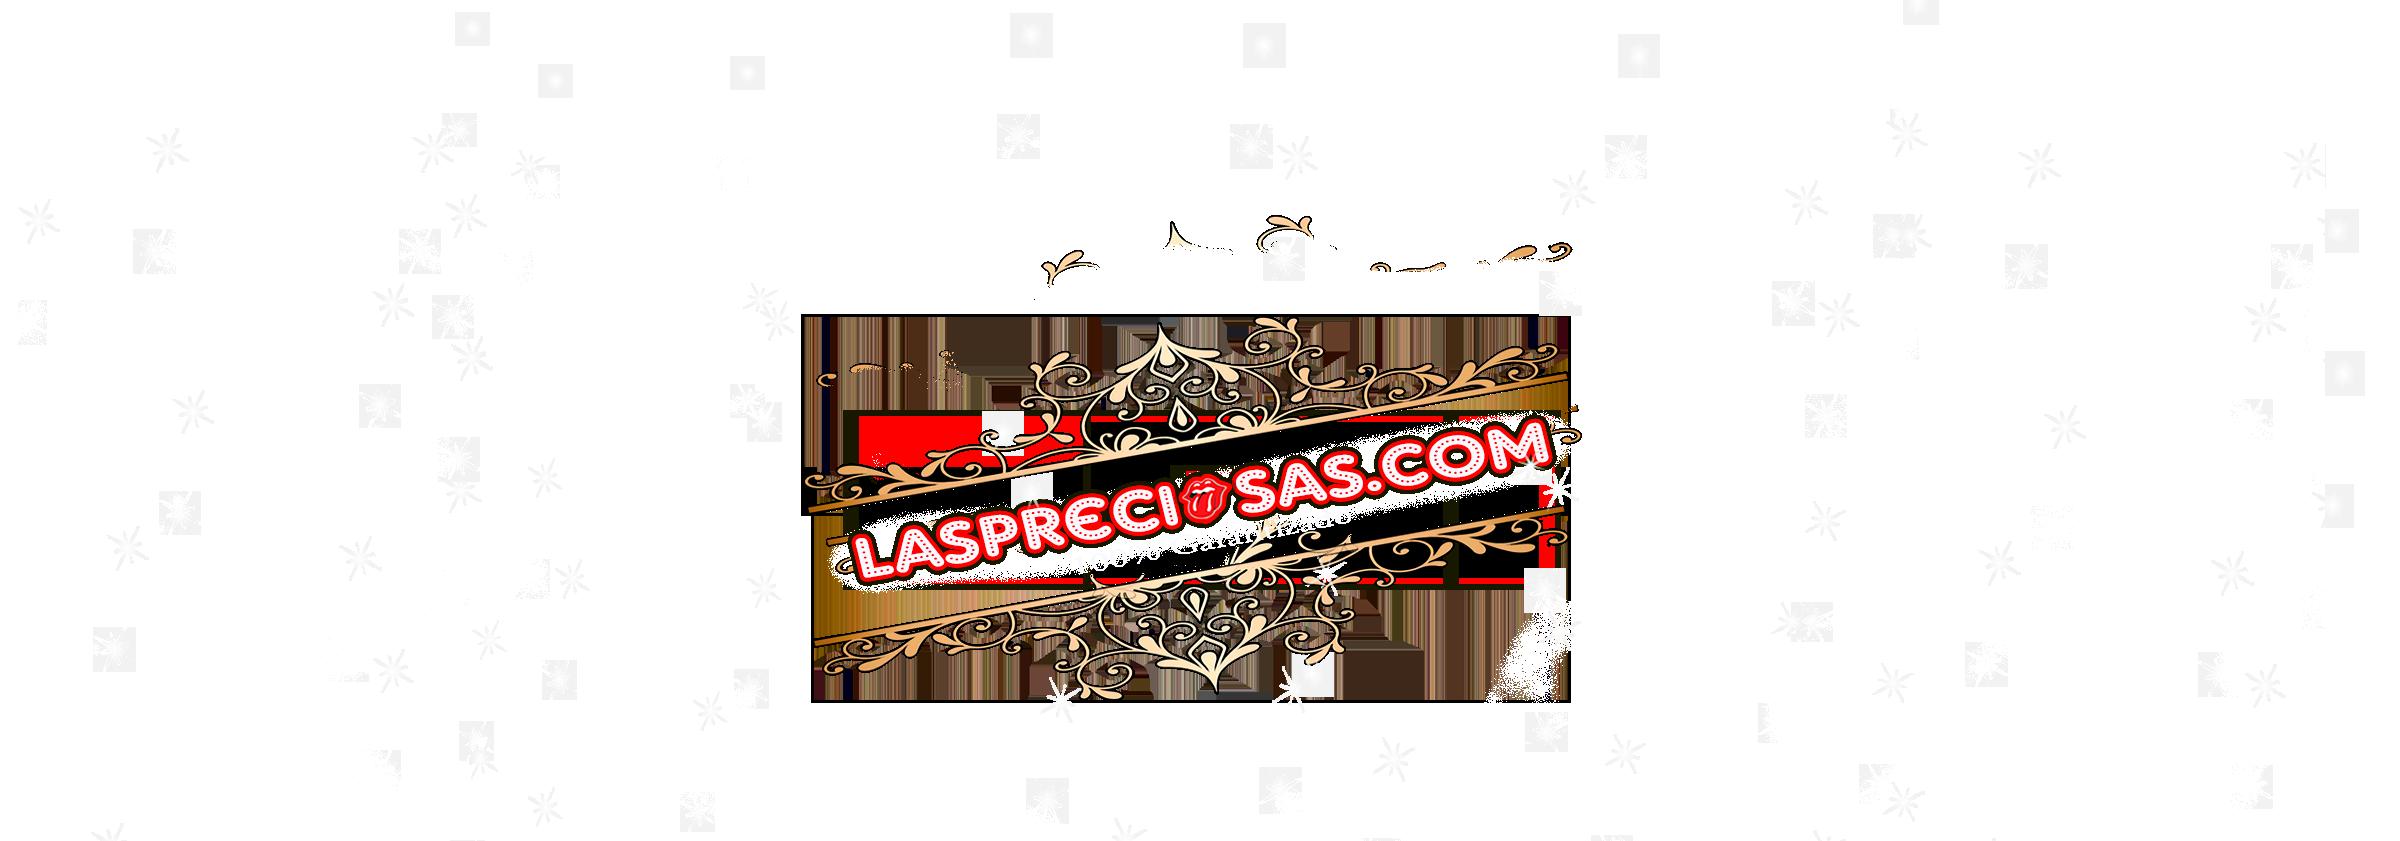 LASPRECIOSAS COM ✌ KINESIOLOGAS ESCORTS PROSTITUTAS EN LIMA PERU PERUVIAN